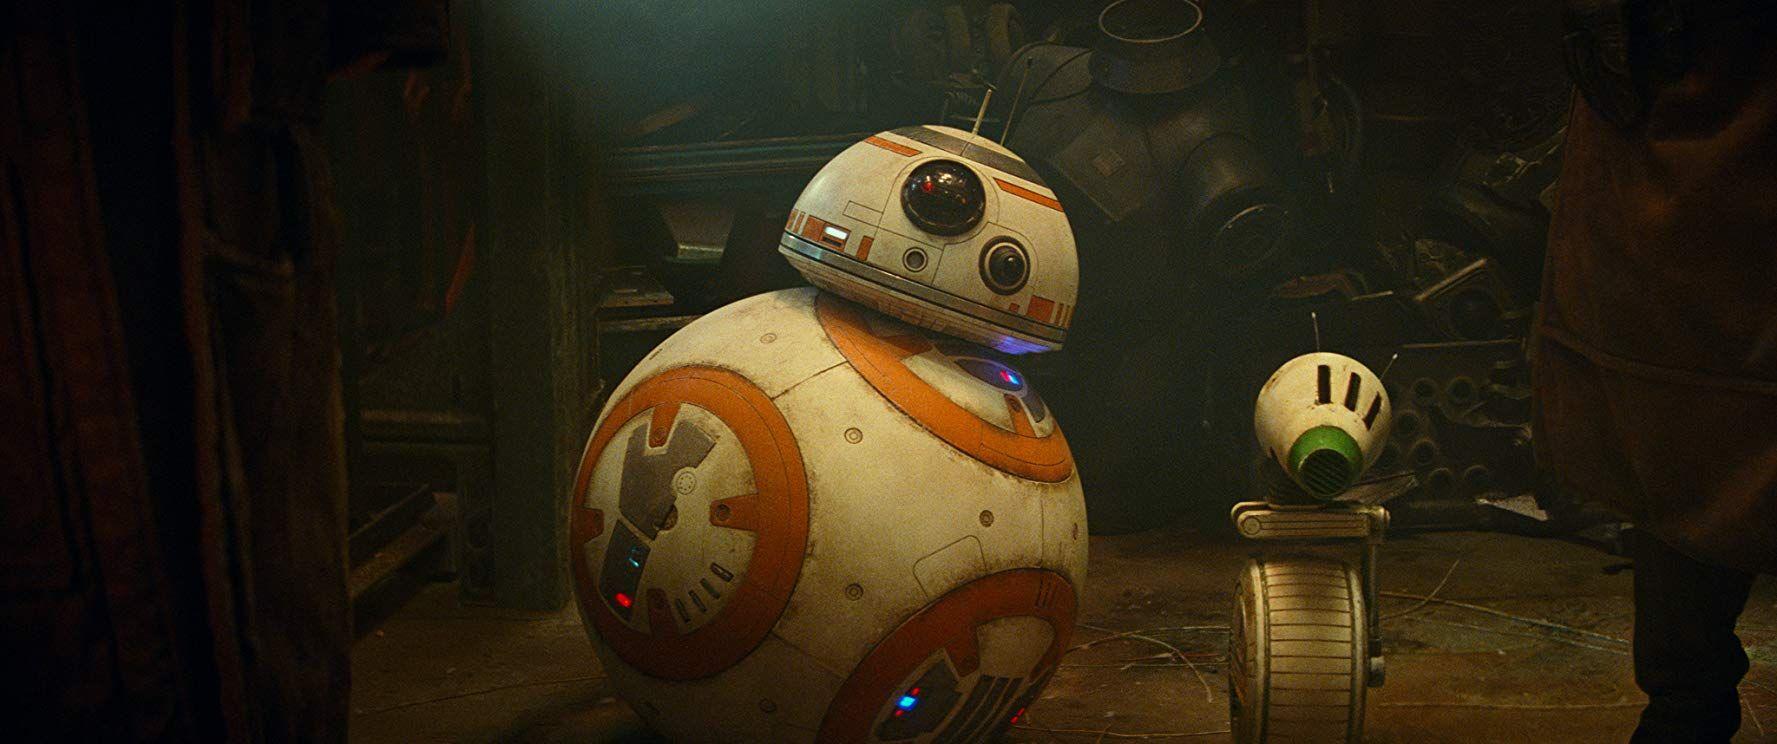 Imagen 8 de Star Wars: El Ascenso de Skywalker